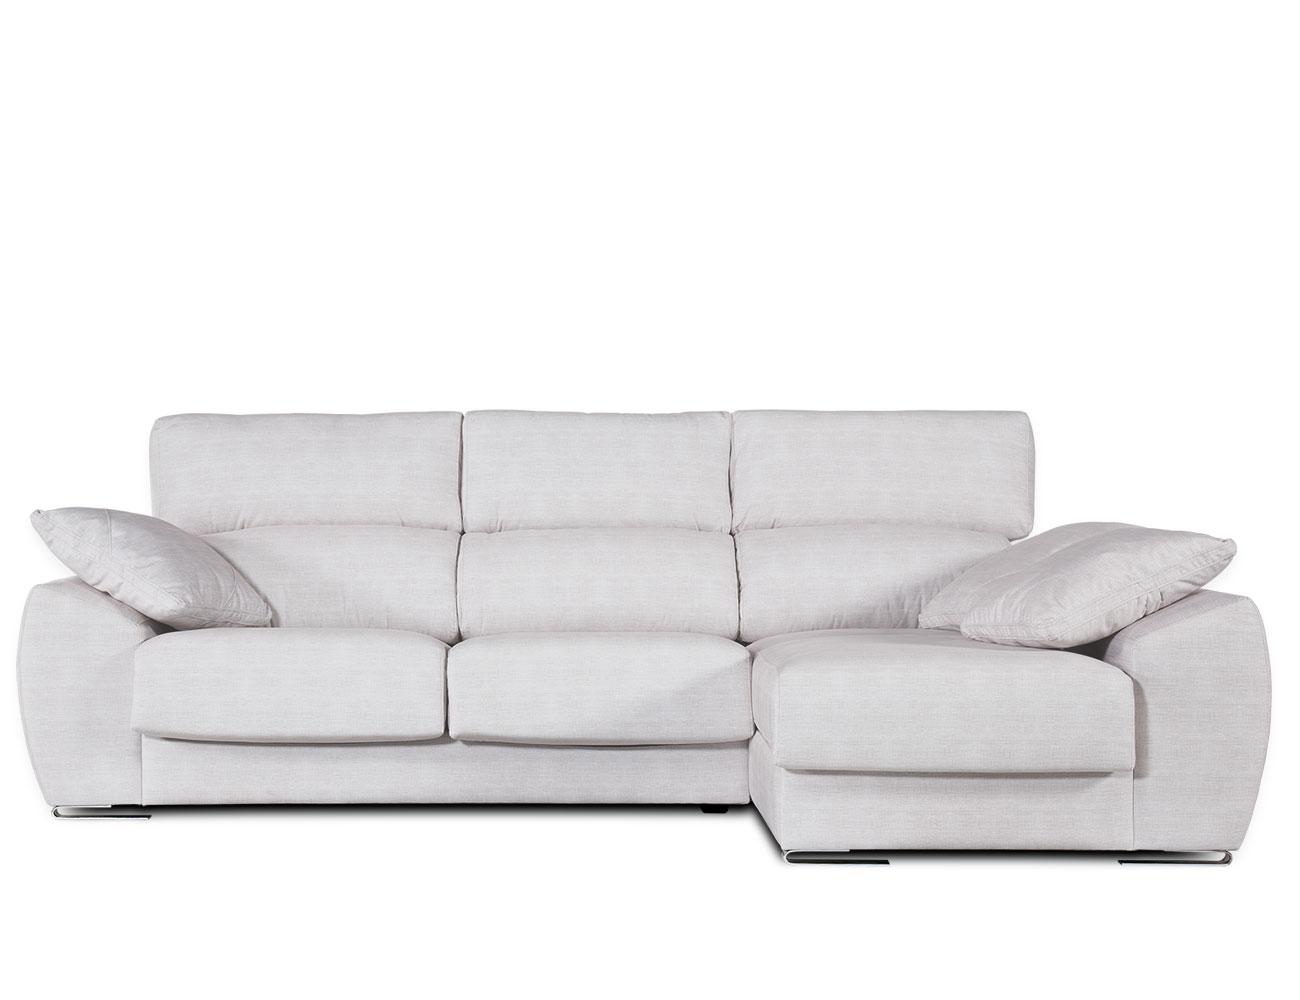 Sofa chaiselongue moderno blanco8